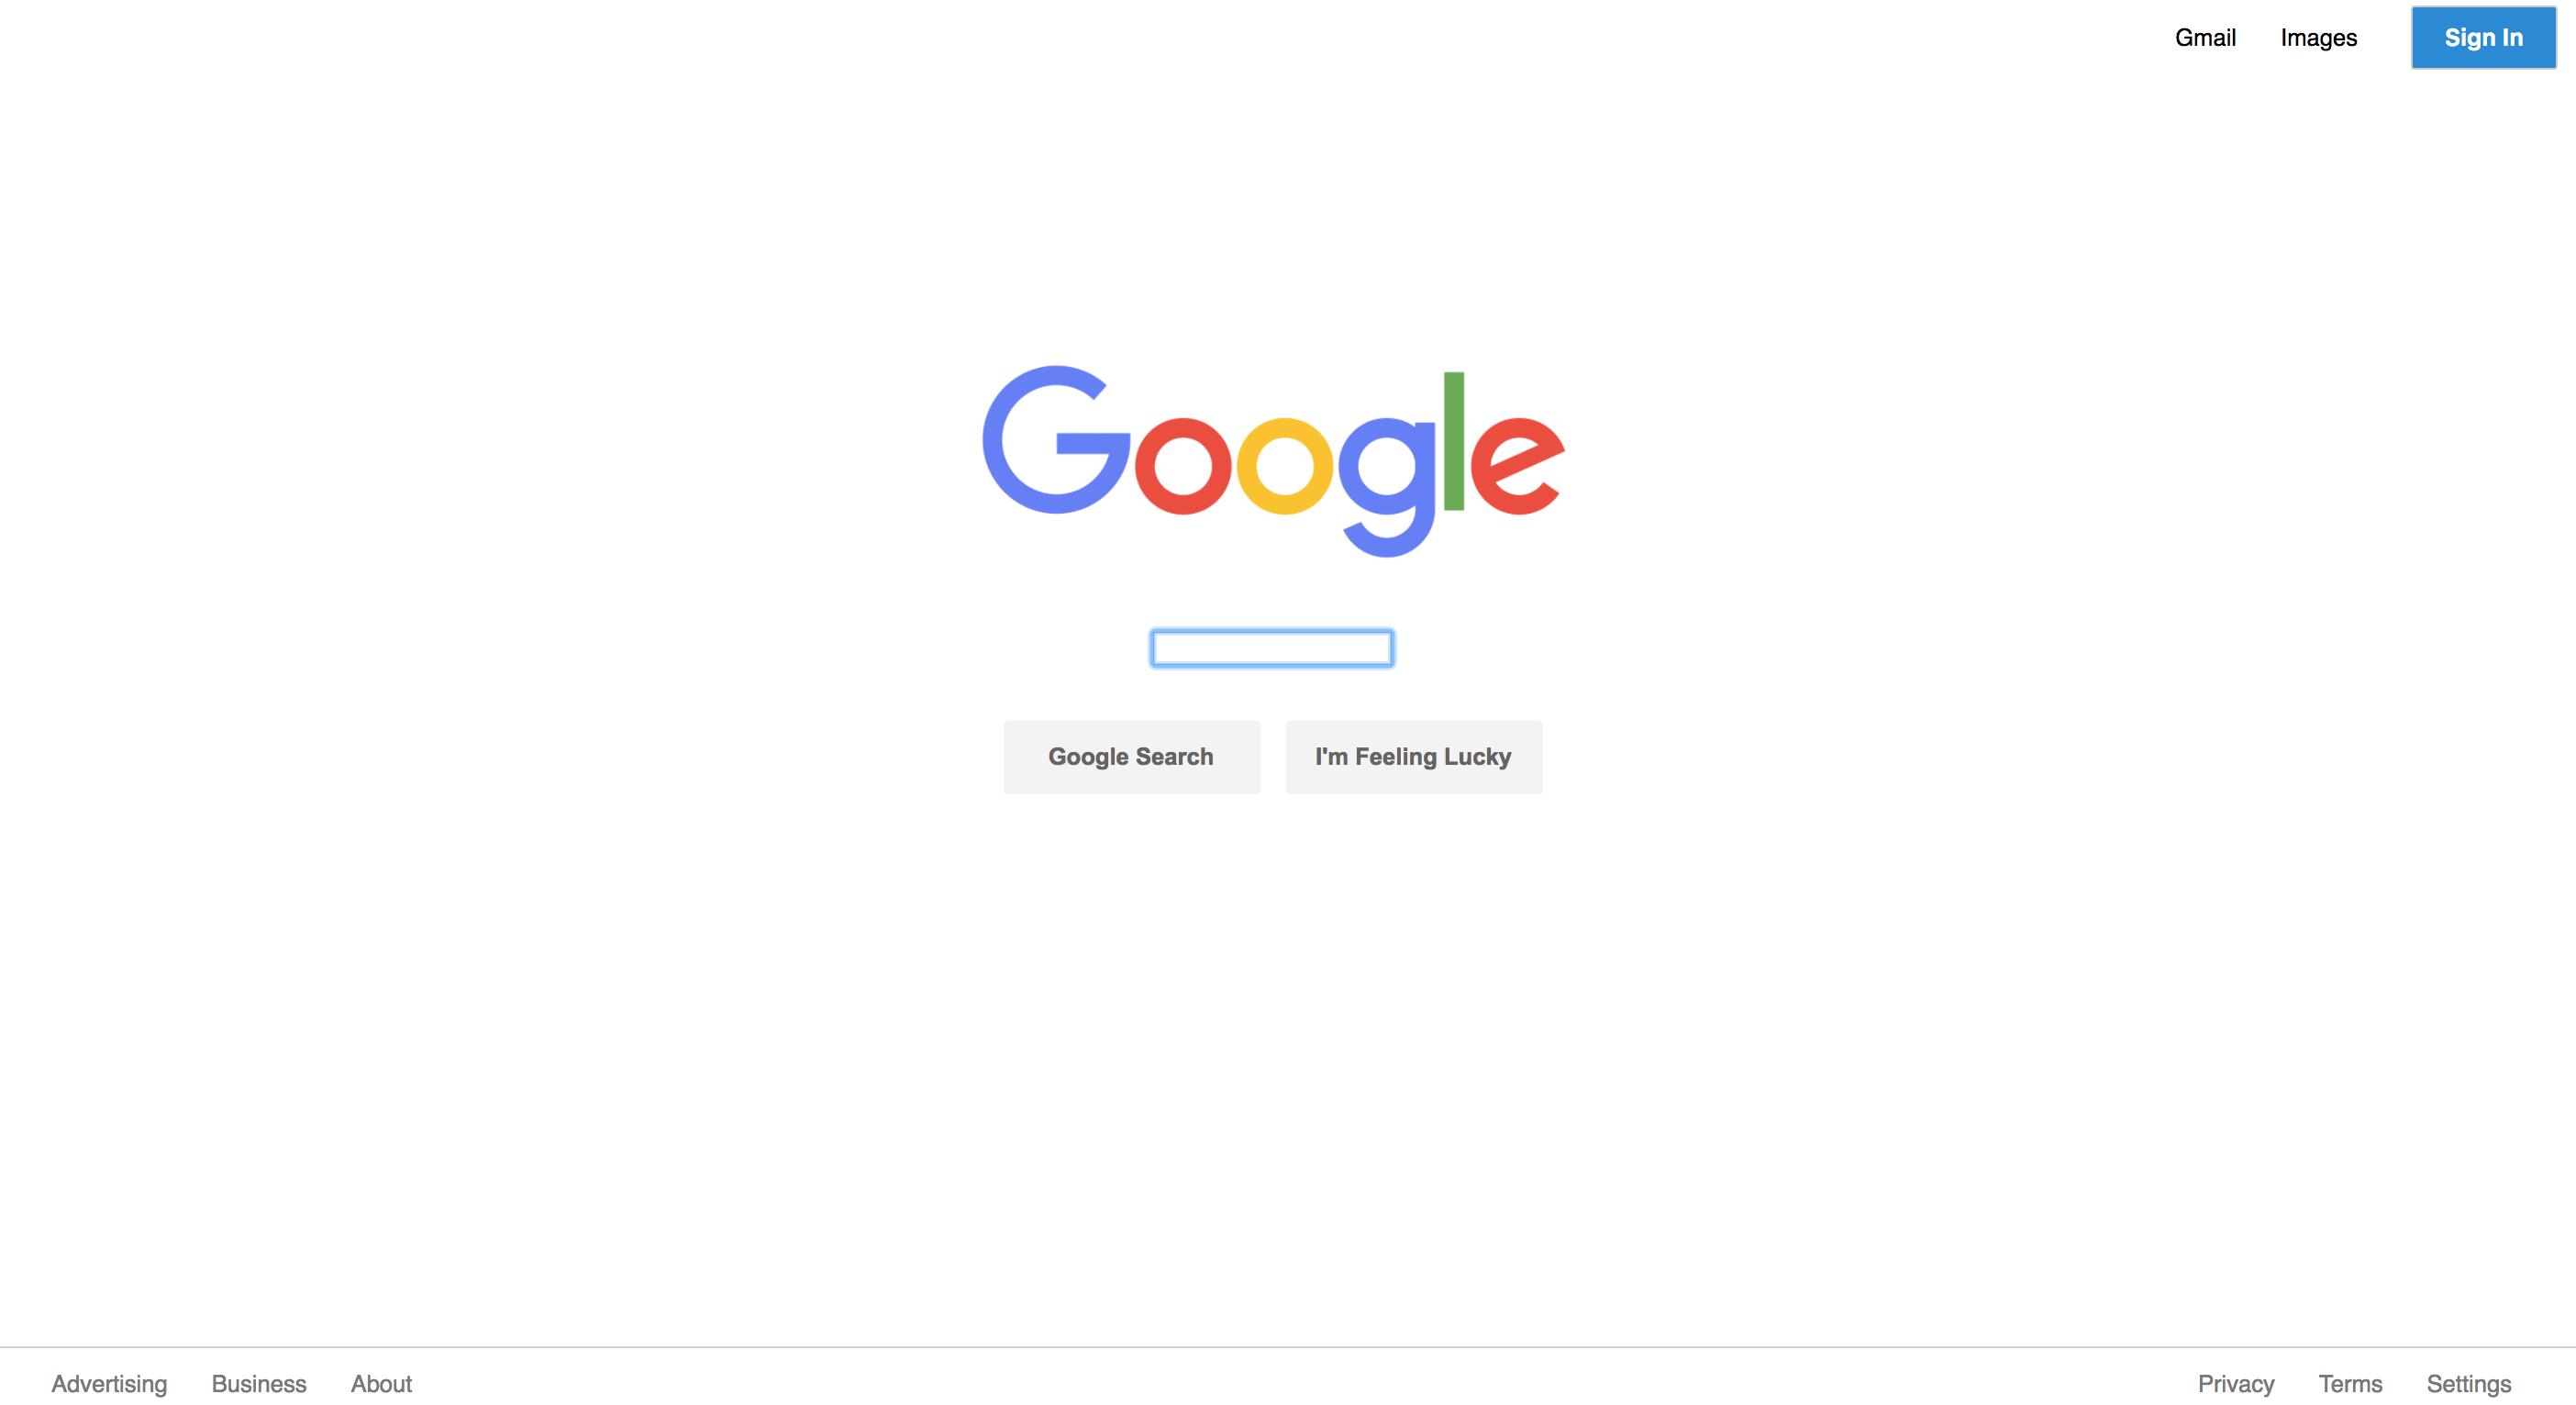 Google home page mockup